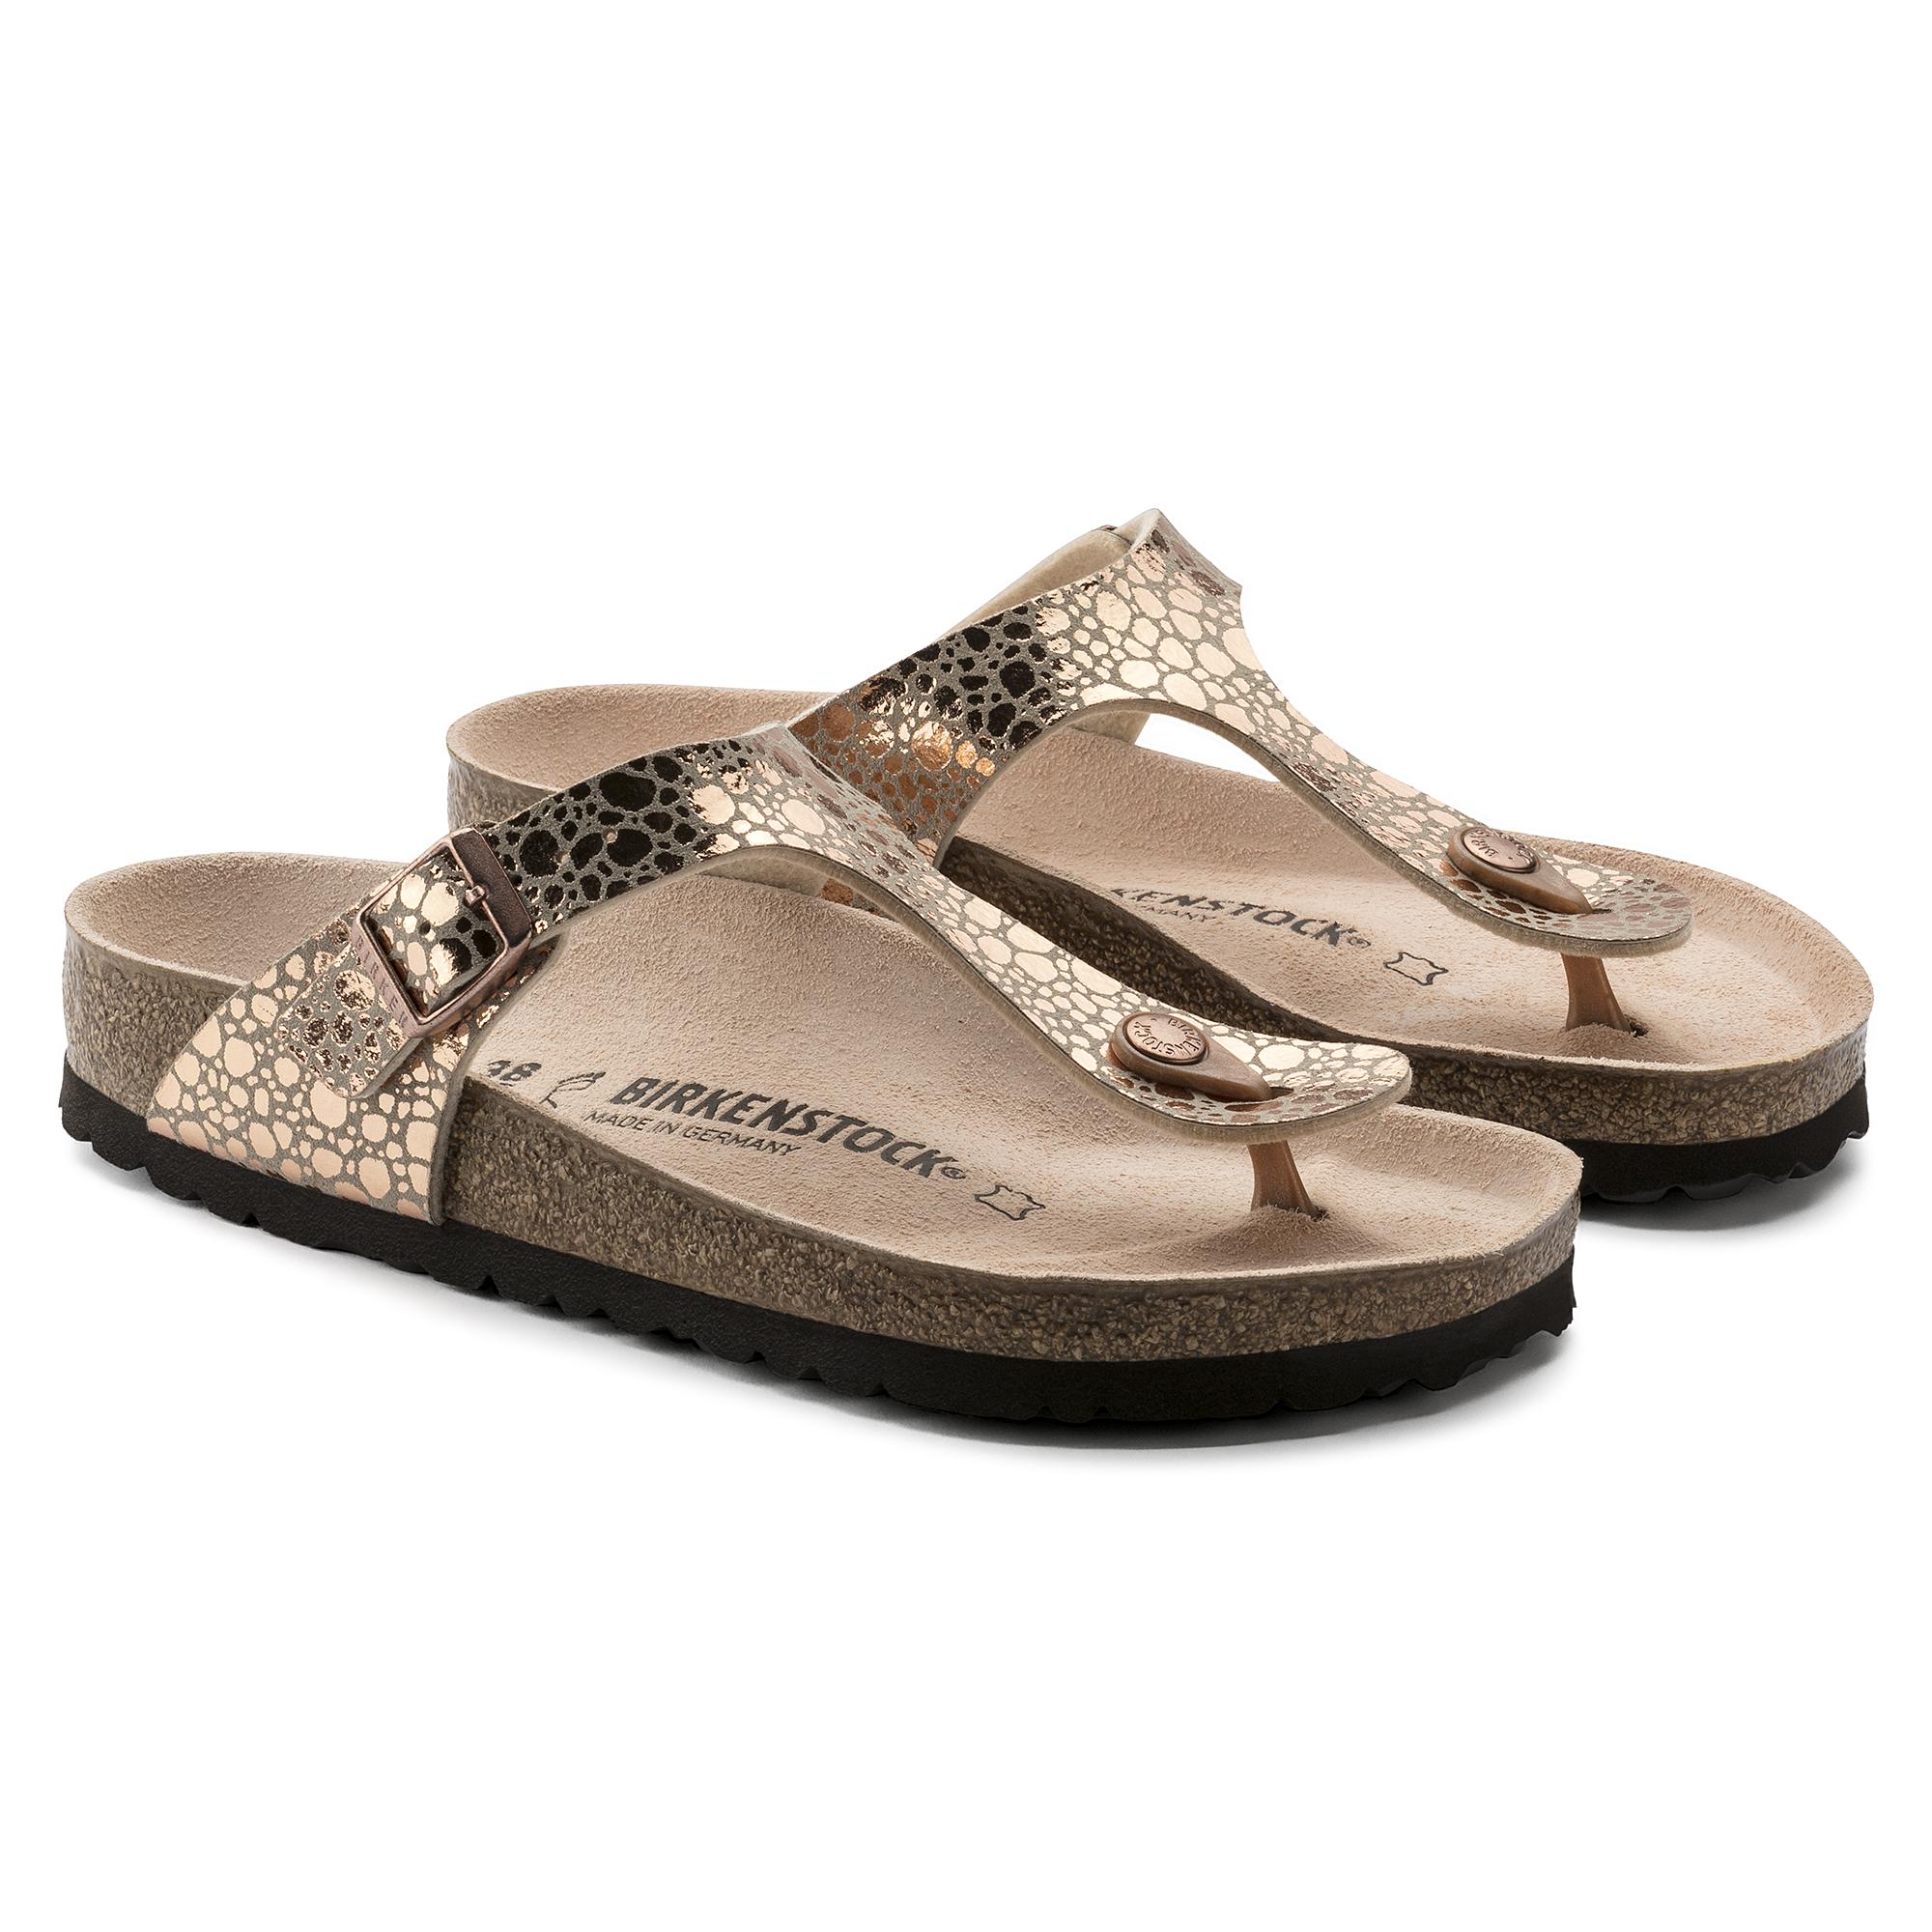 Birkenstock Gizeh Metallic Stones Copper Shoemed